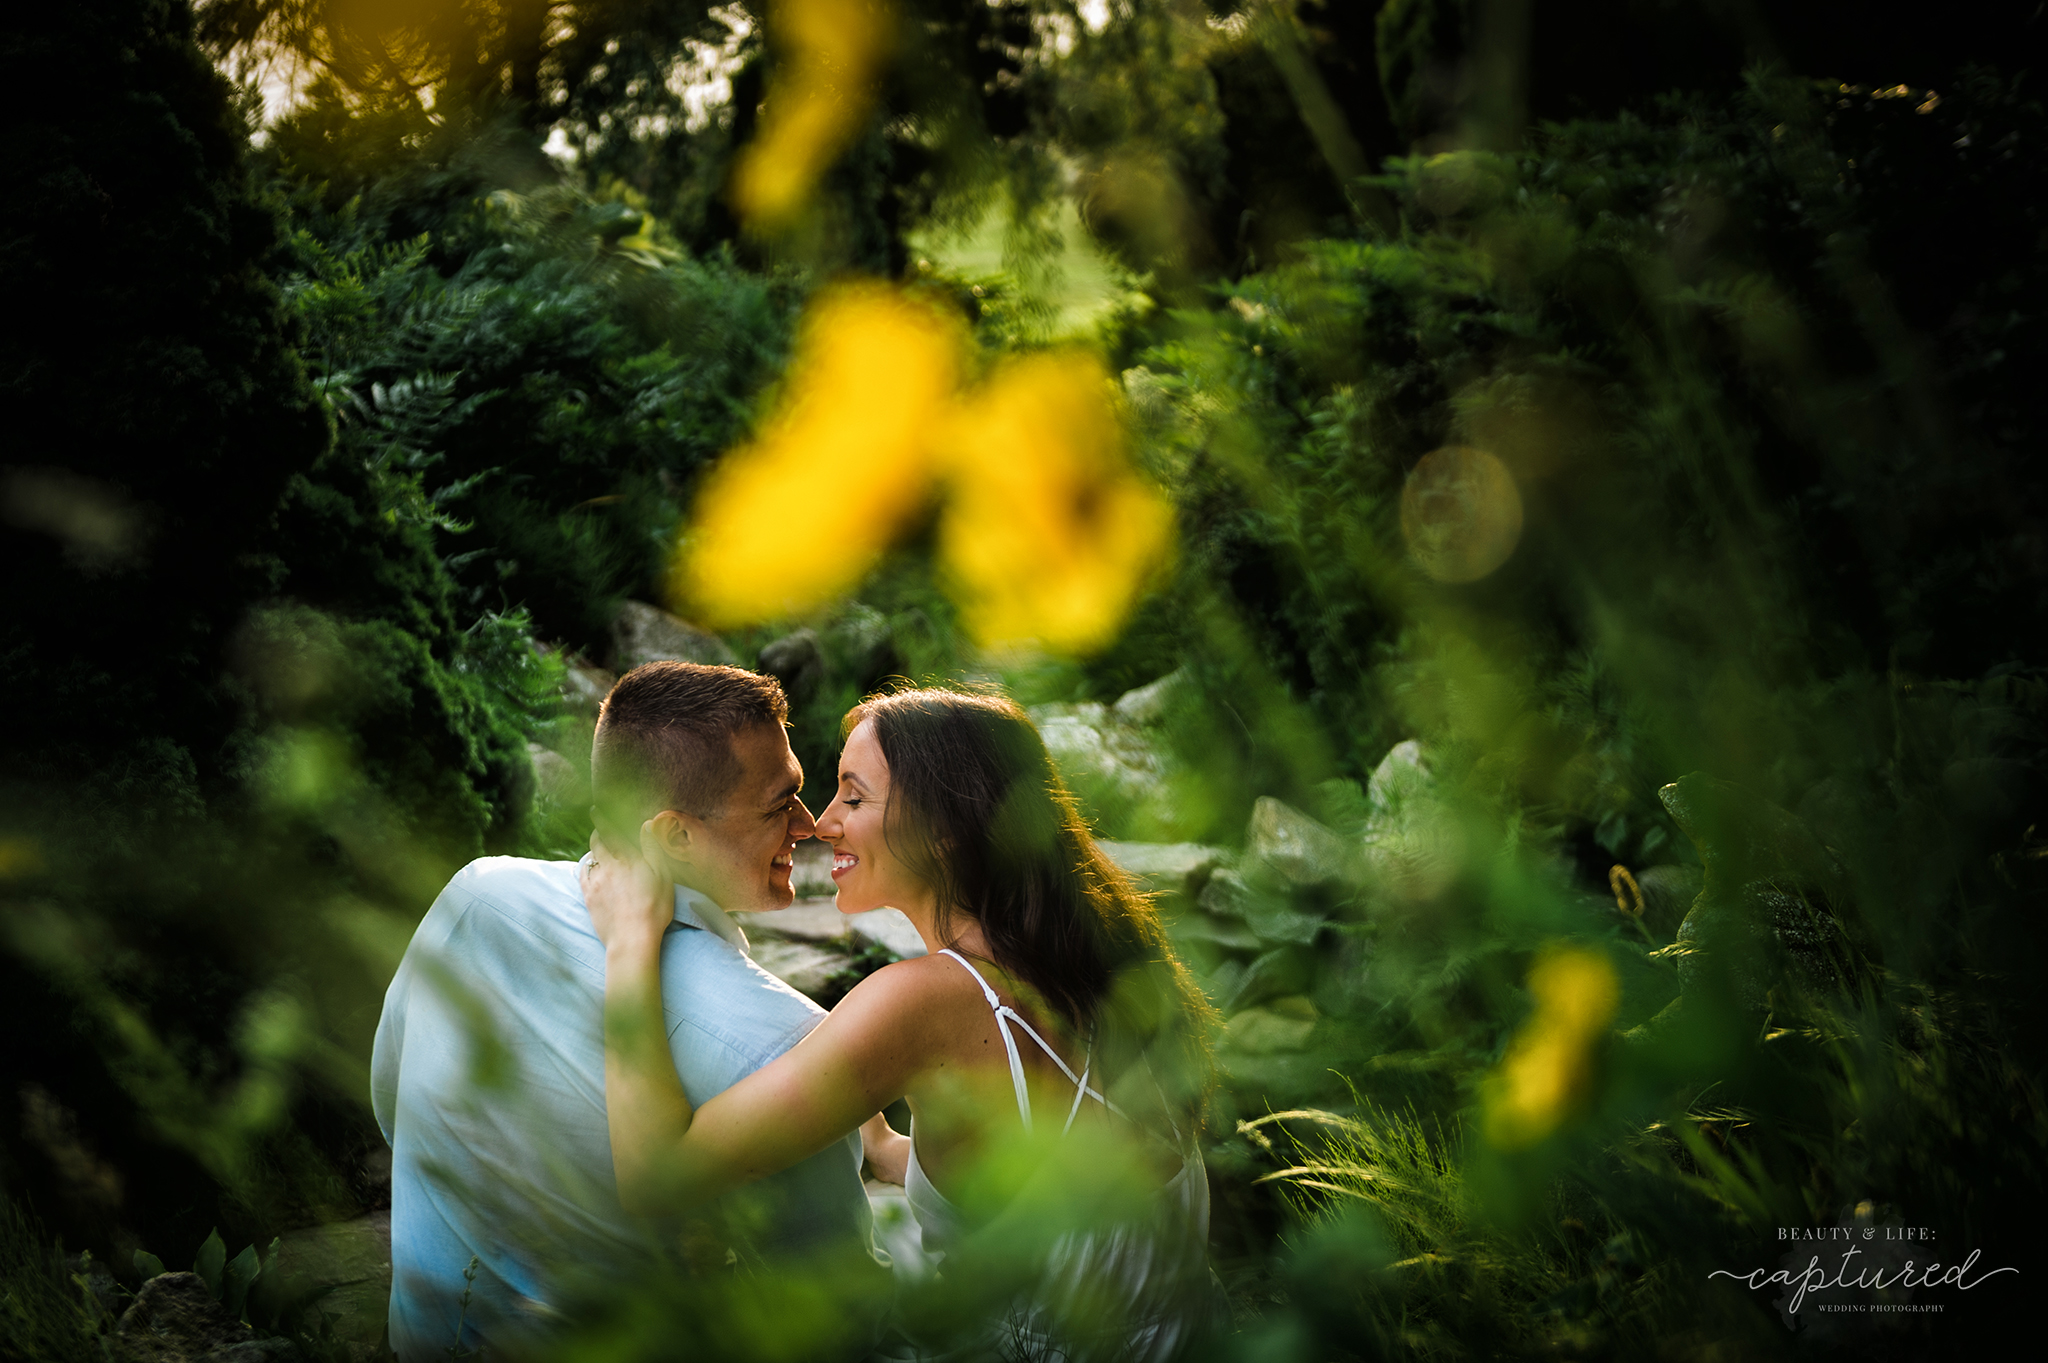 Beautyandlifecaptured_Jake_and_K_Engagement-103.jpg